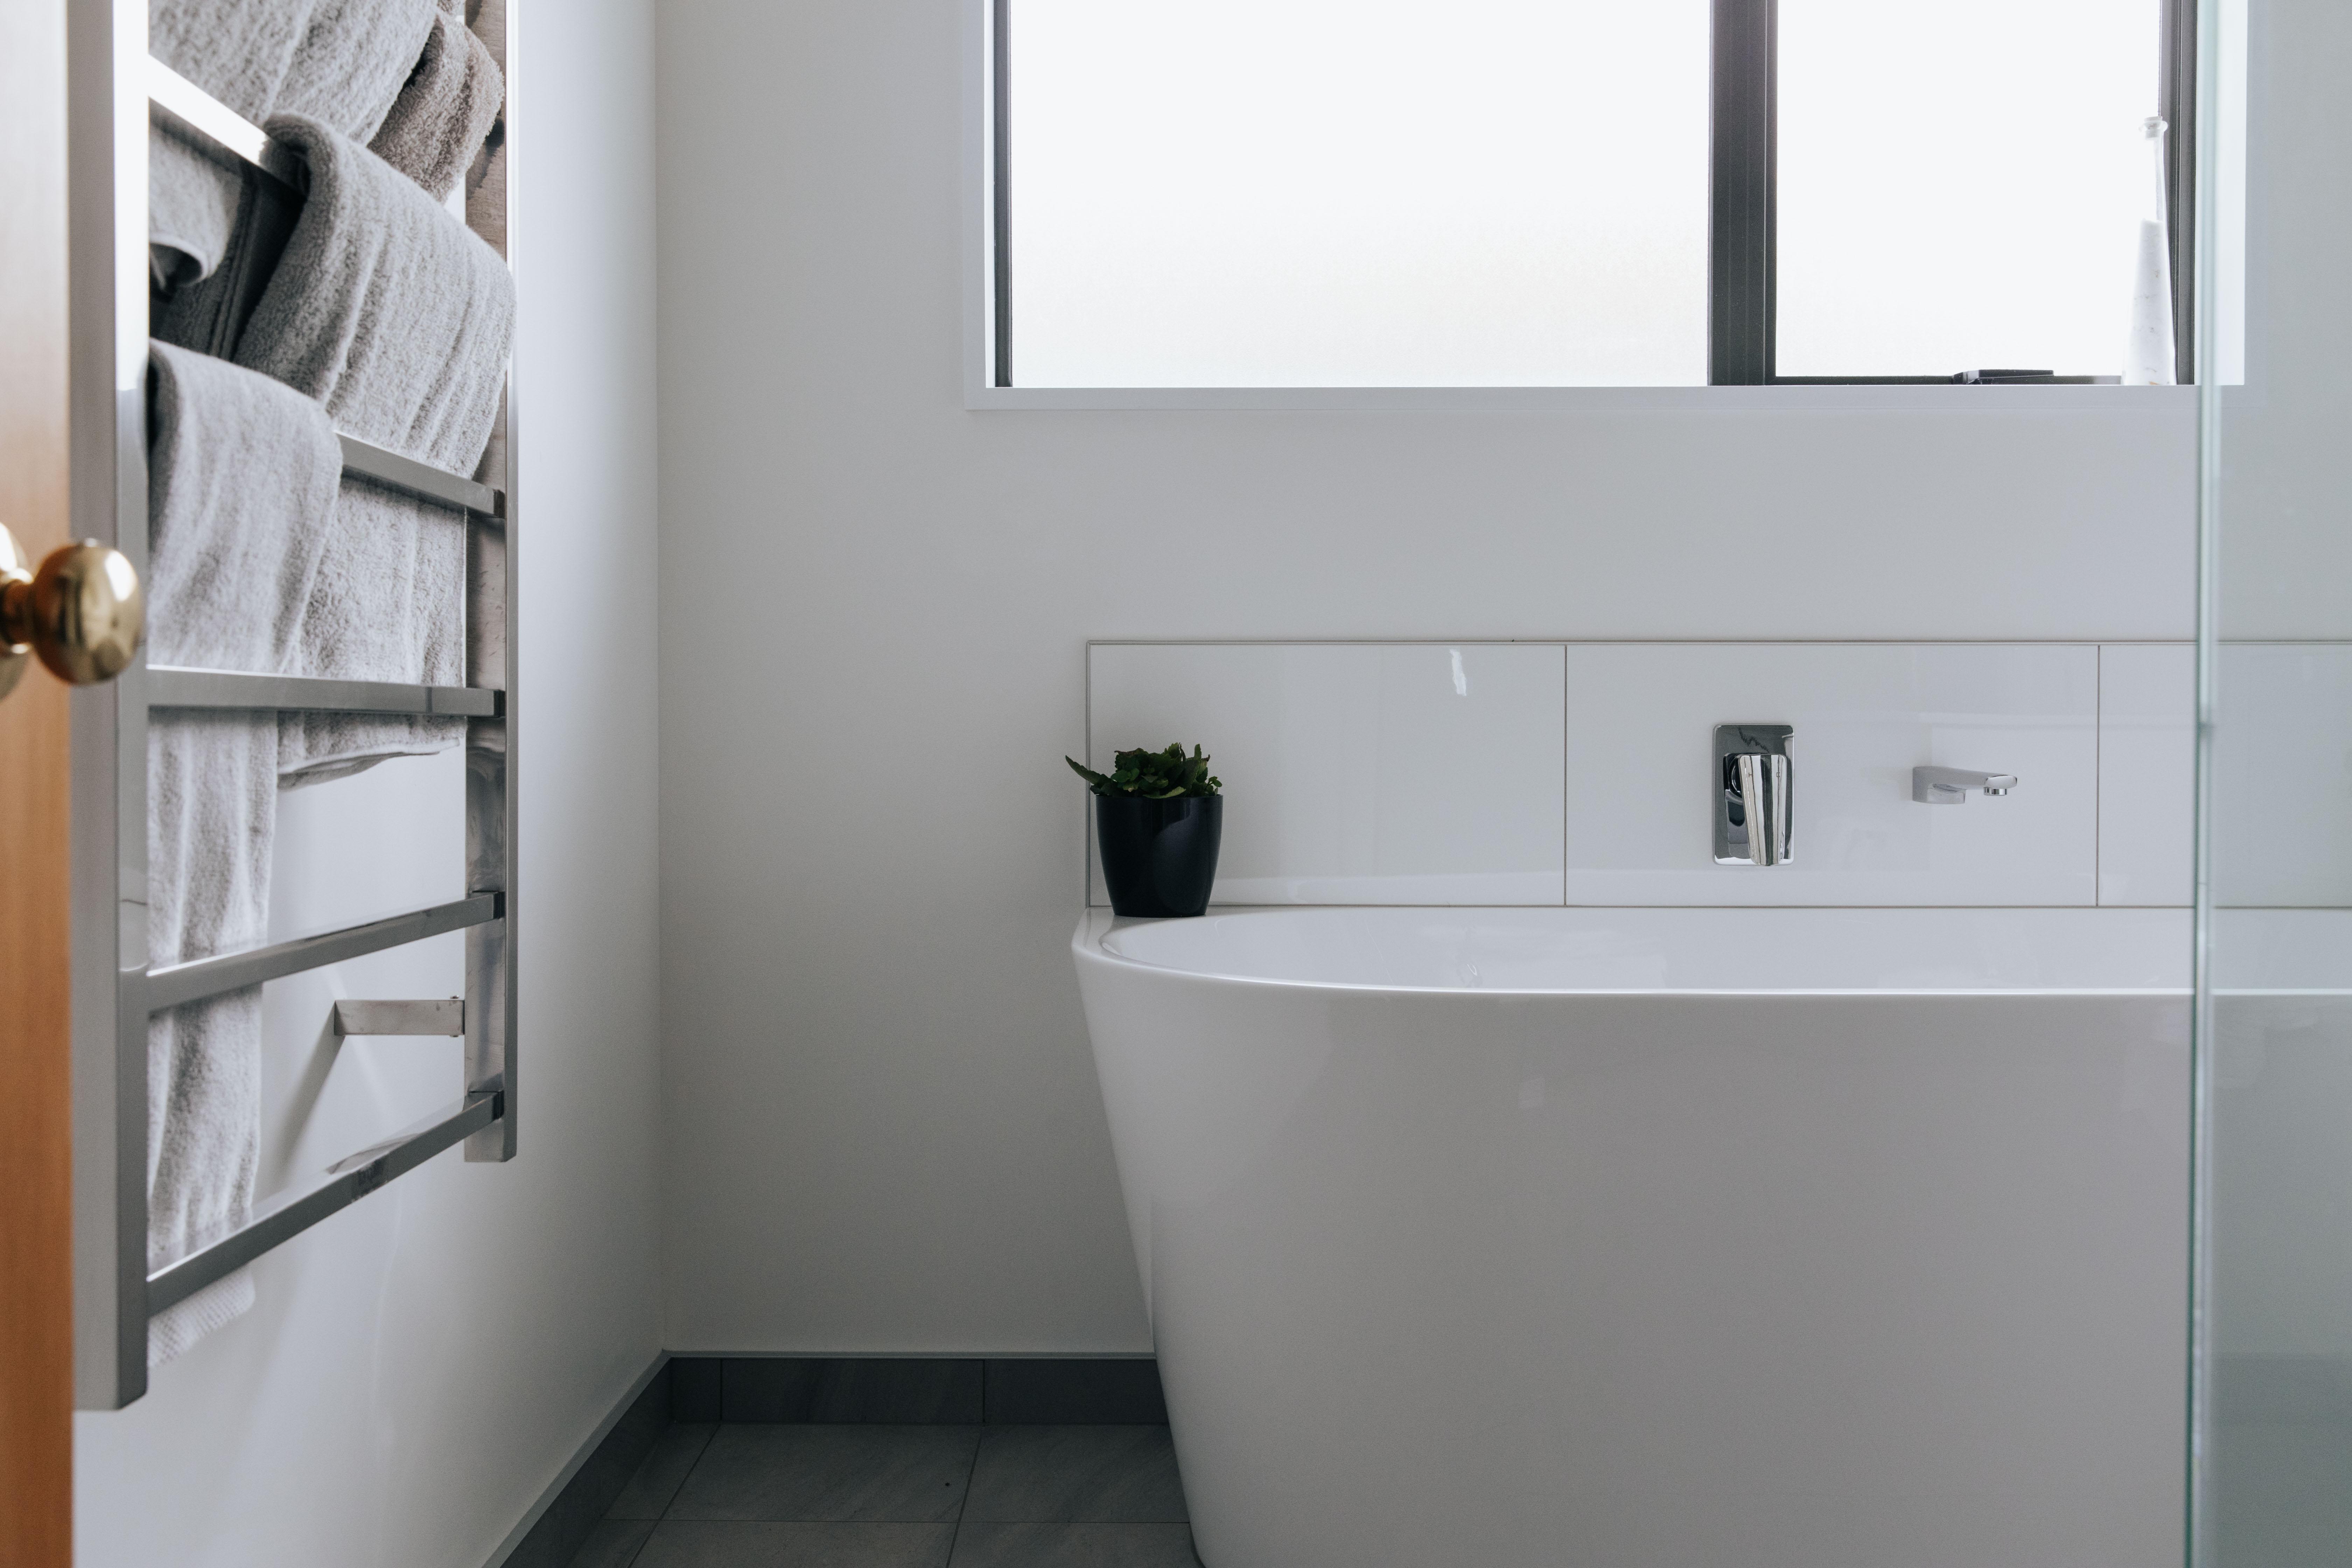 Tiled bathroom with freestanding bath